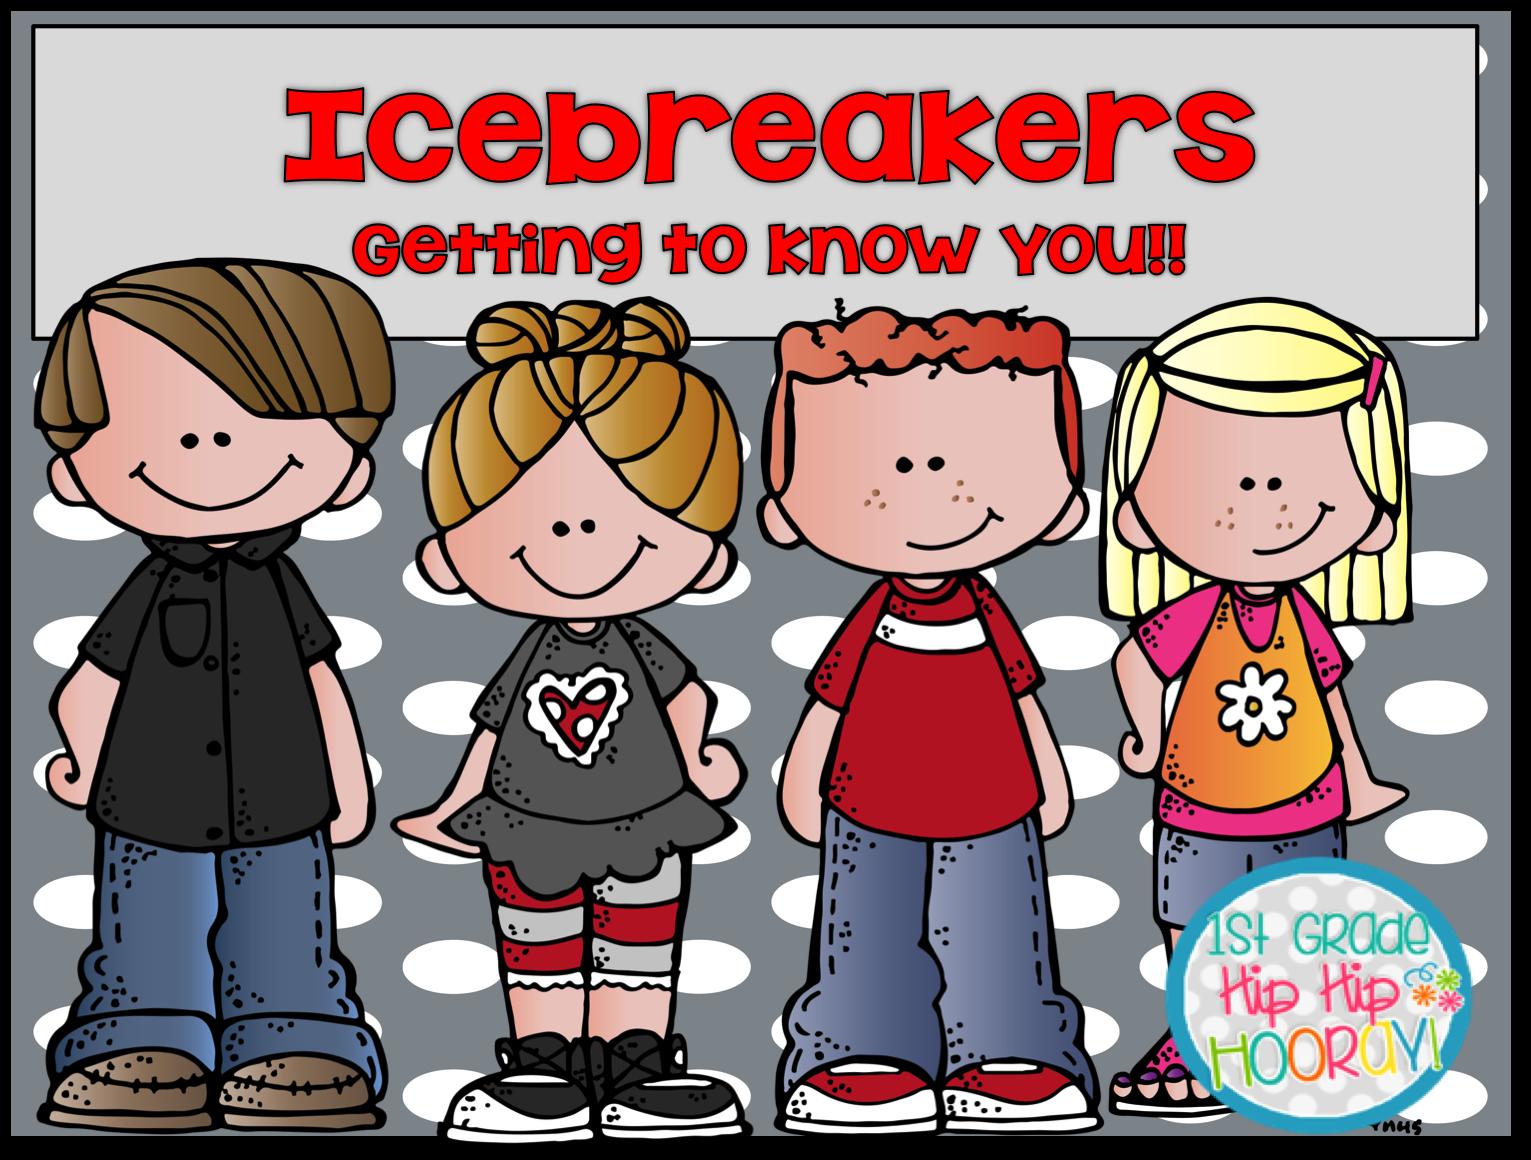 1st Grade Hip Hip Hooray Icebreakers For Back To School